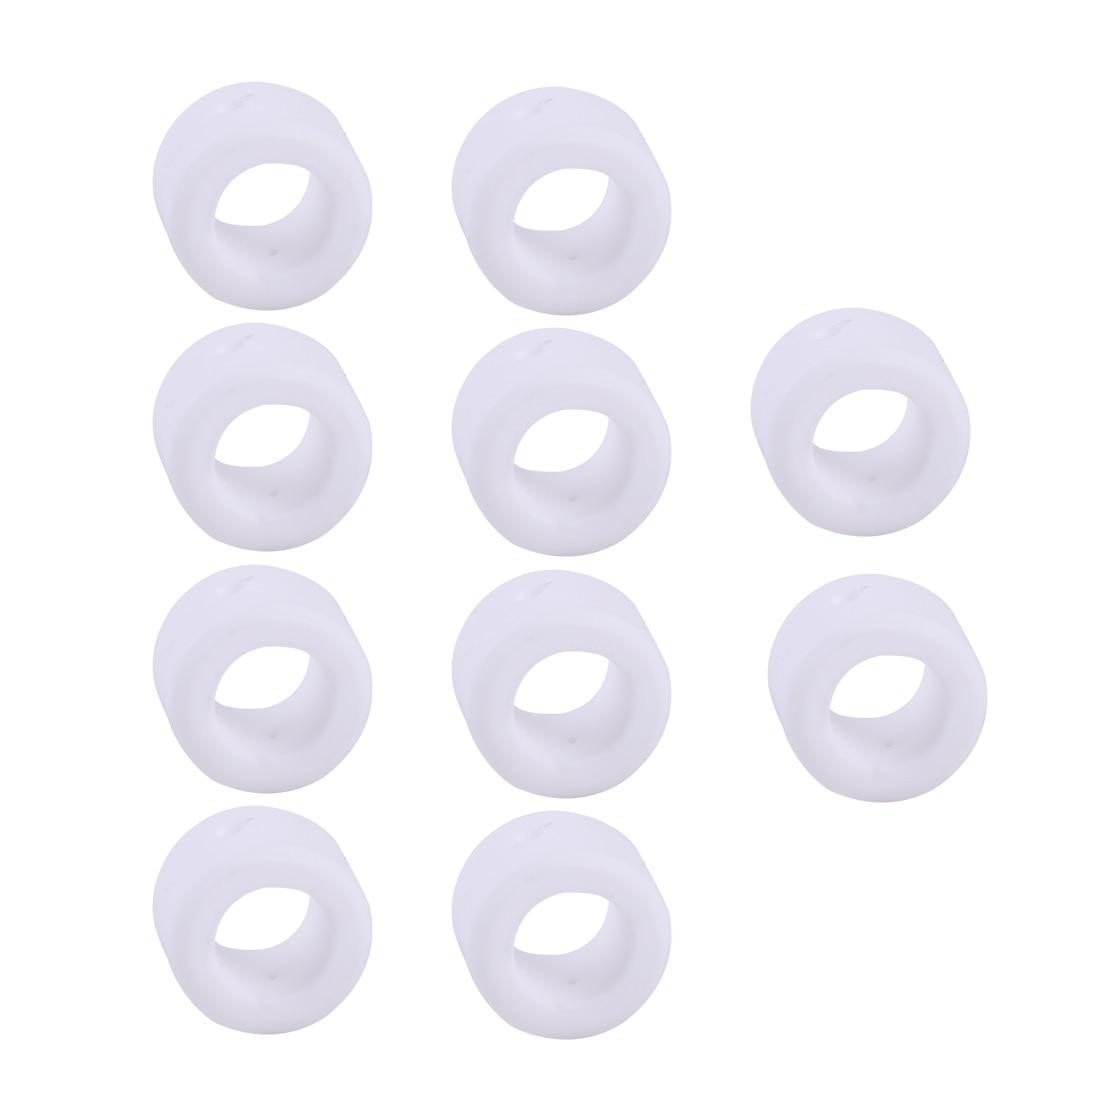 LETAOSK 10pcs Ceramics Swirl Ring Baffle Fit For LG-40 PT-31 CUT40 CUT50 Plasma Cutter Cutting Torch